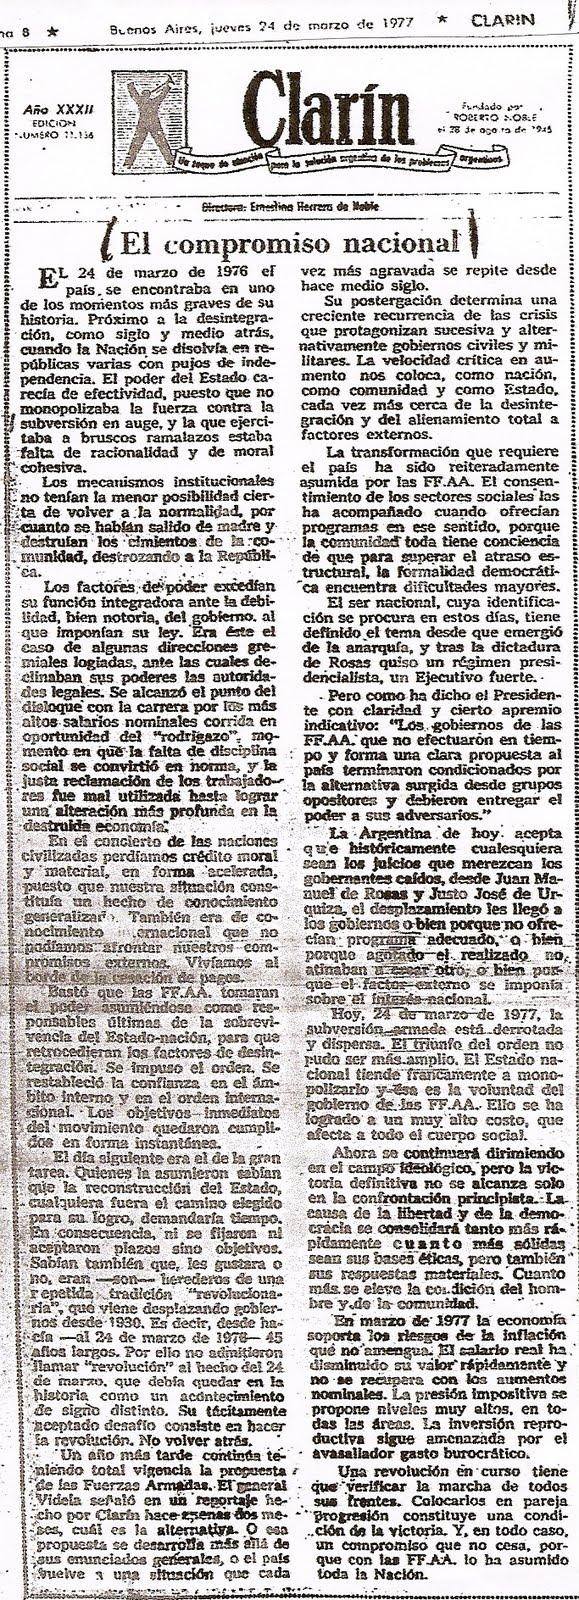 Editorial Clarín 1977